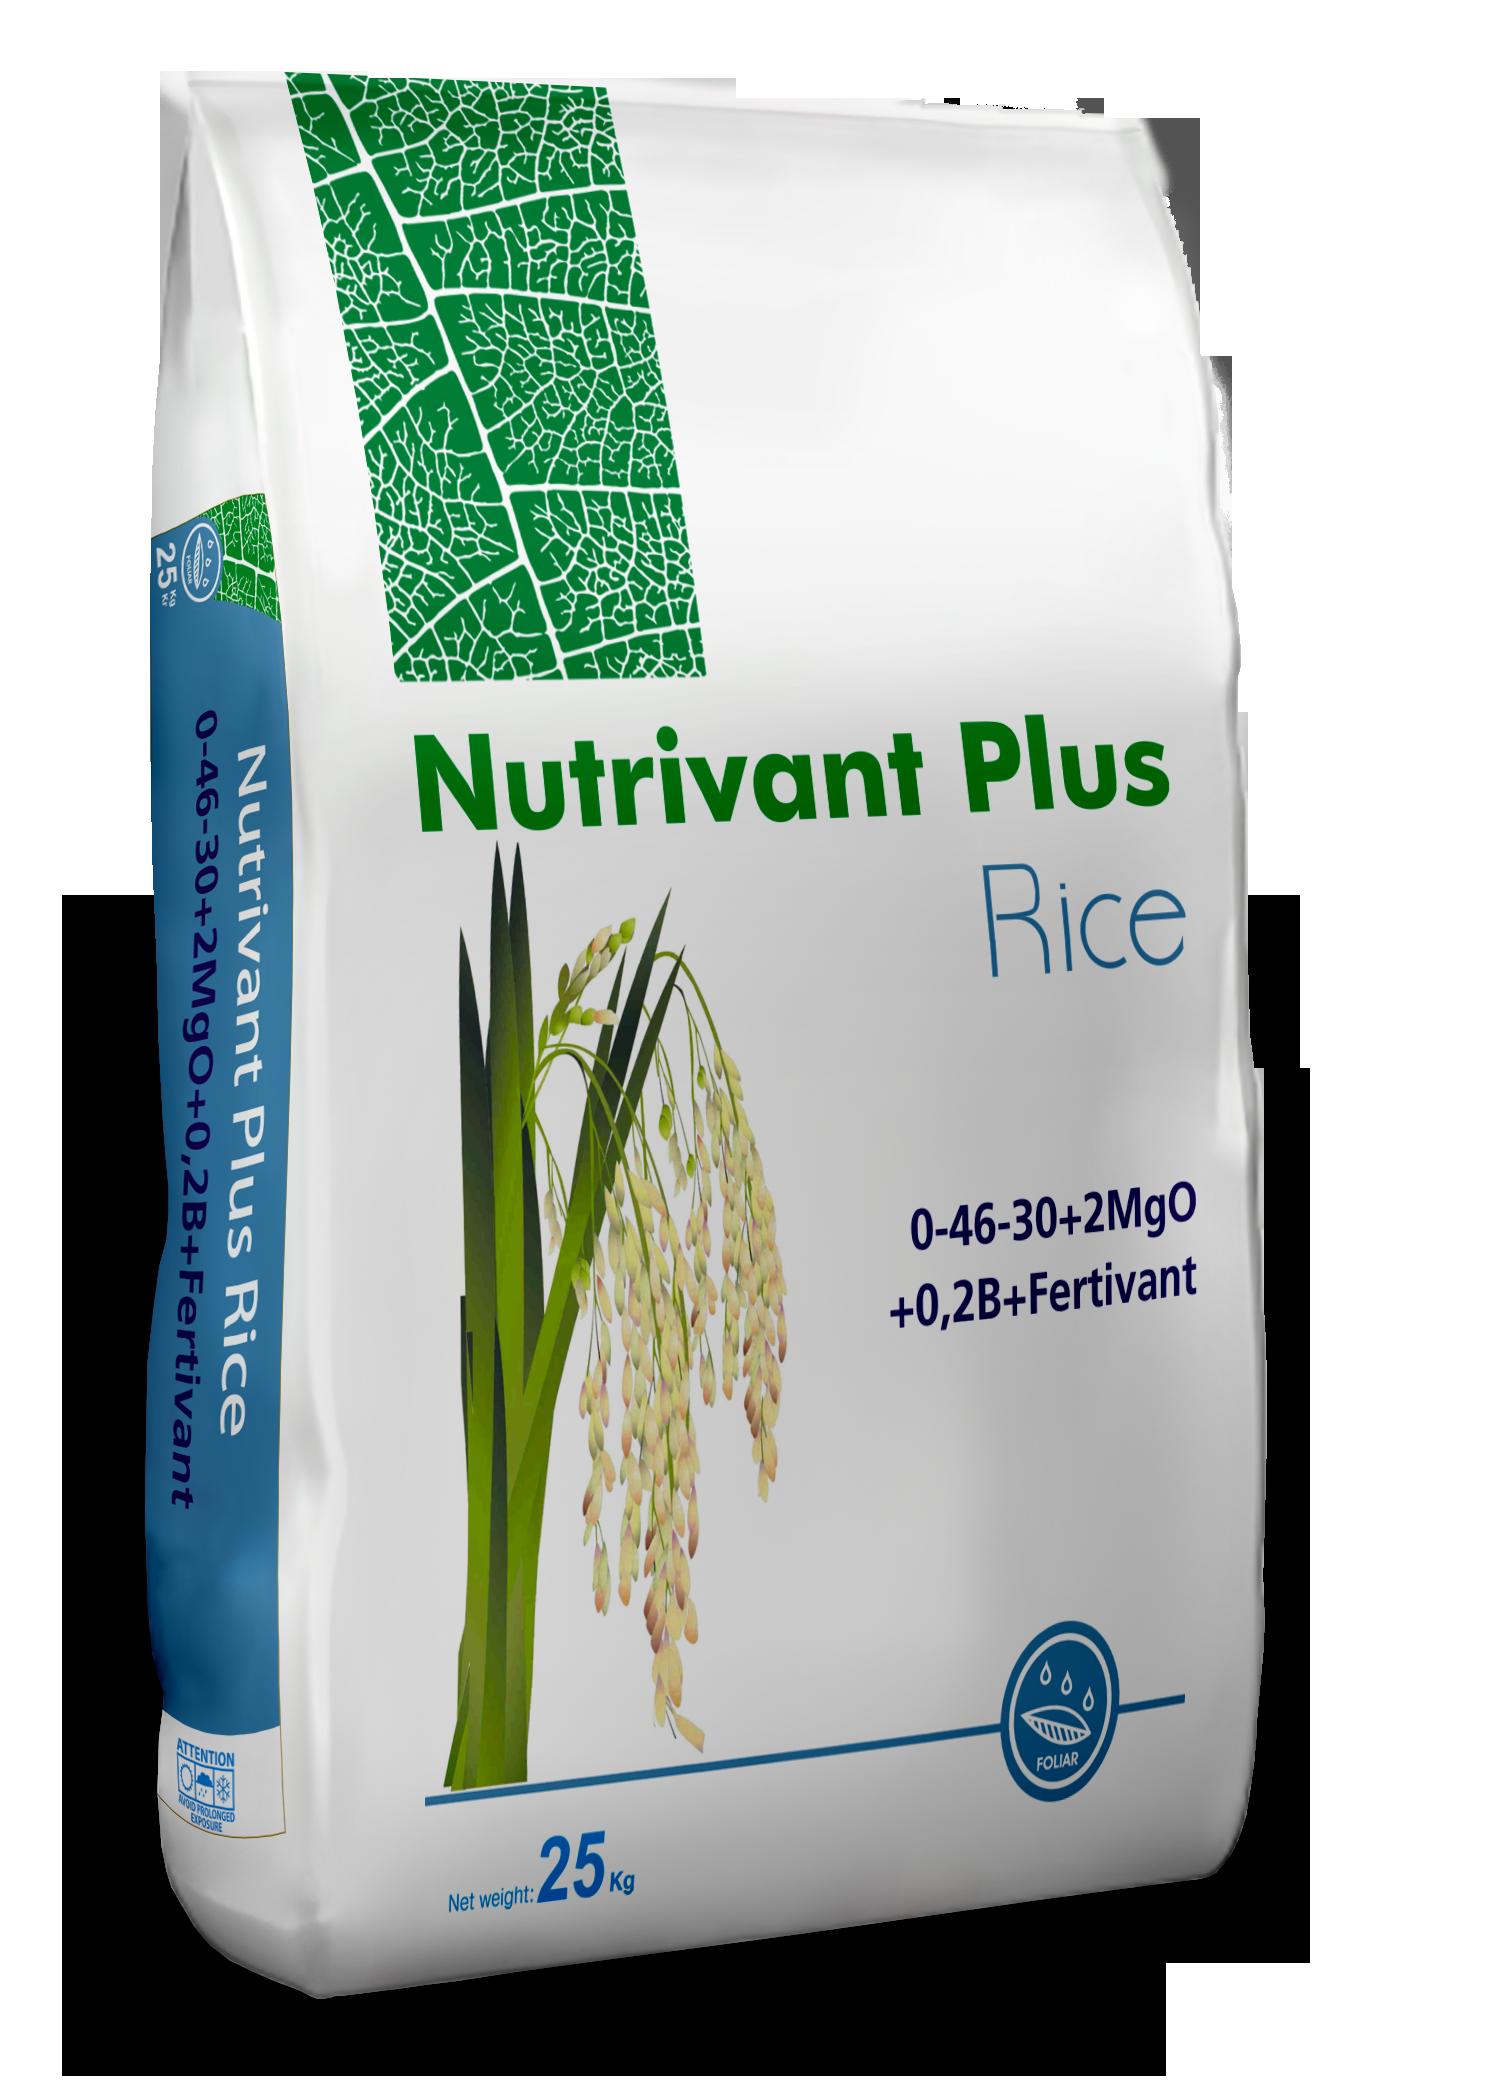 Nutrivant Plus Rice